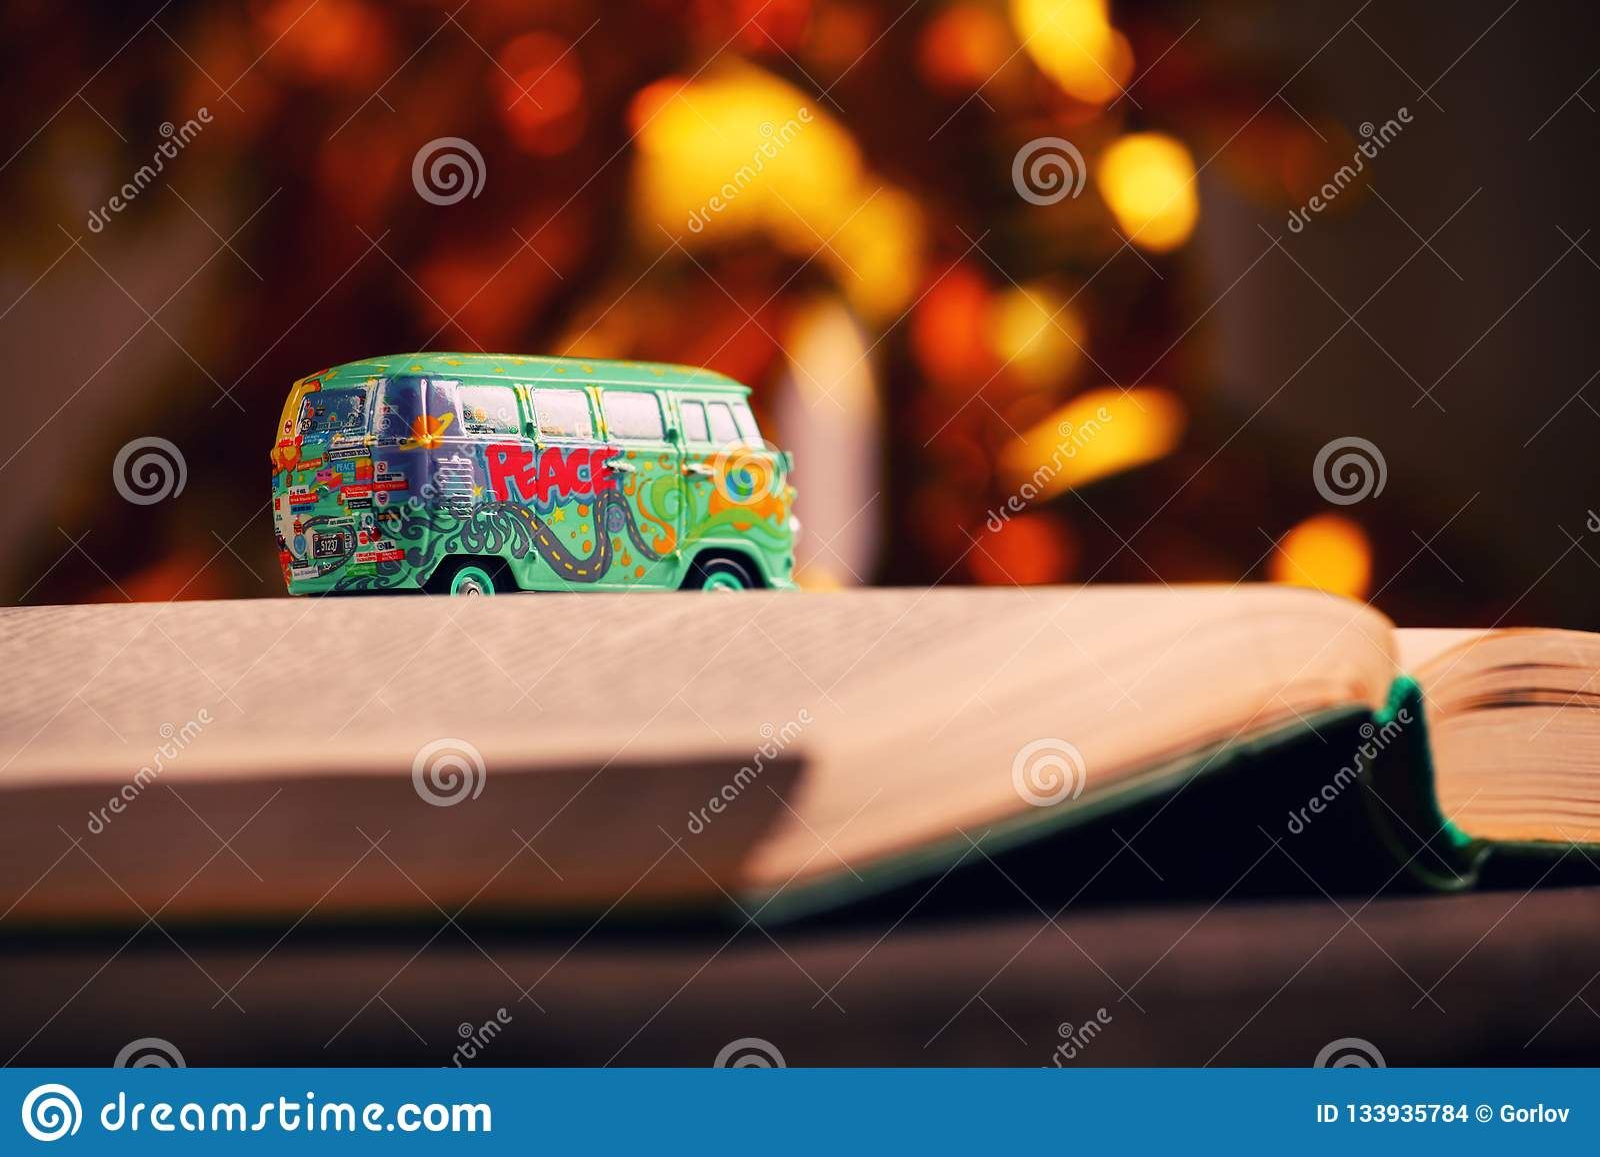 Estudio del bokeh del oro del libro del coche del juguete